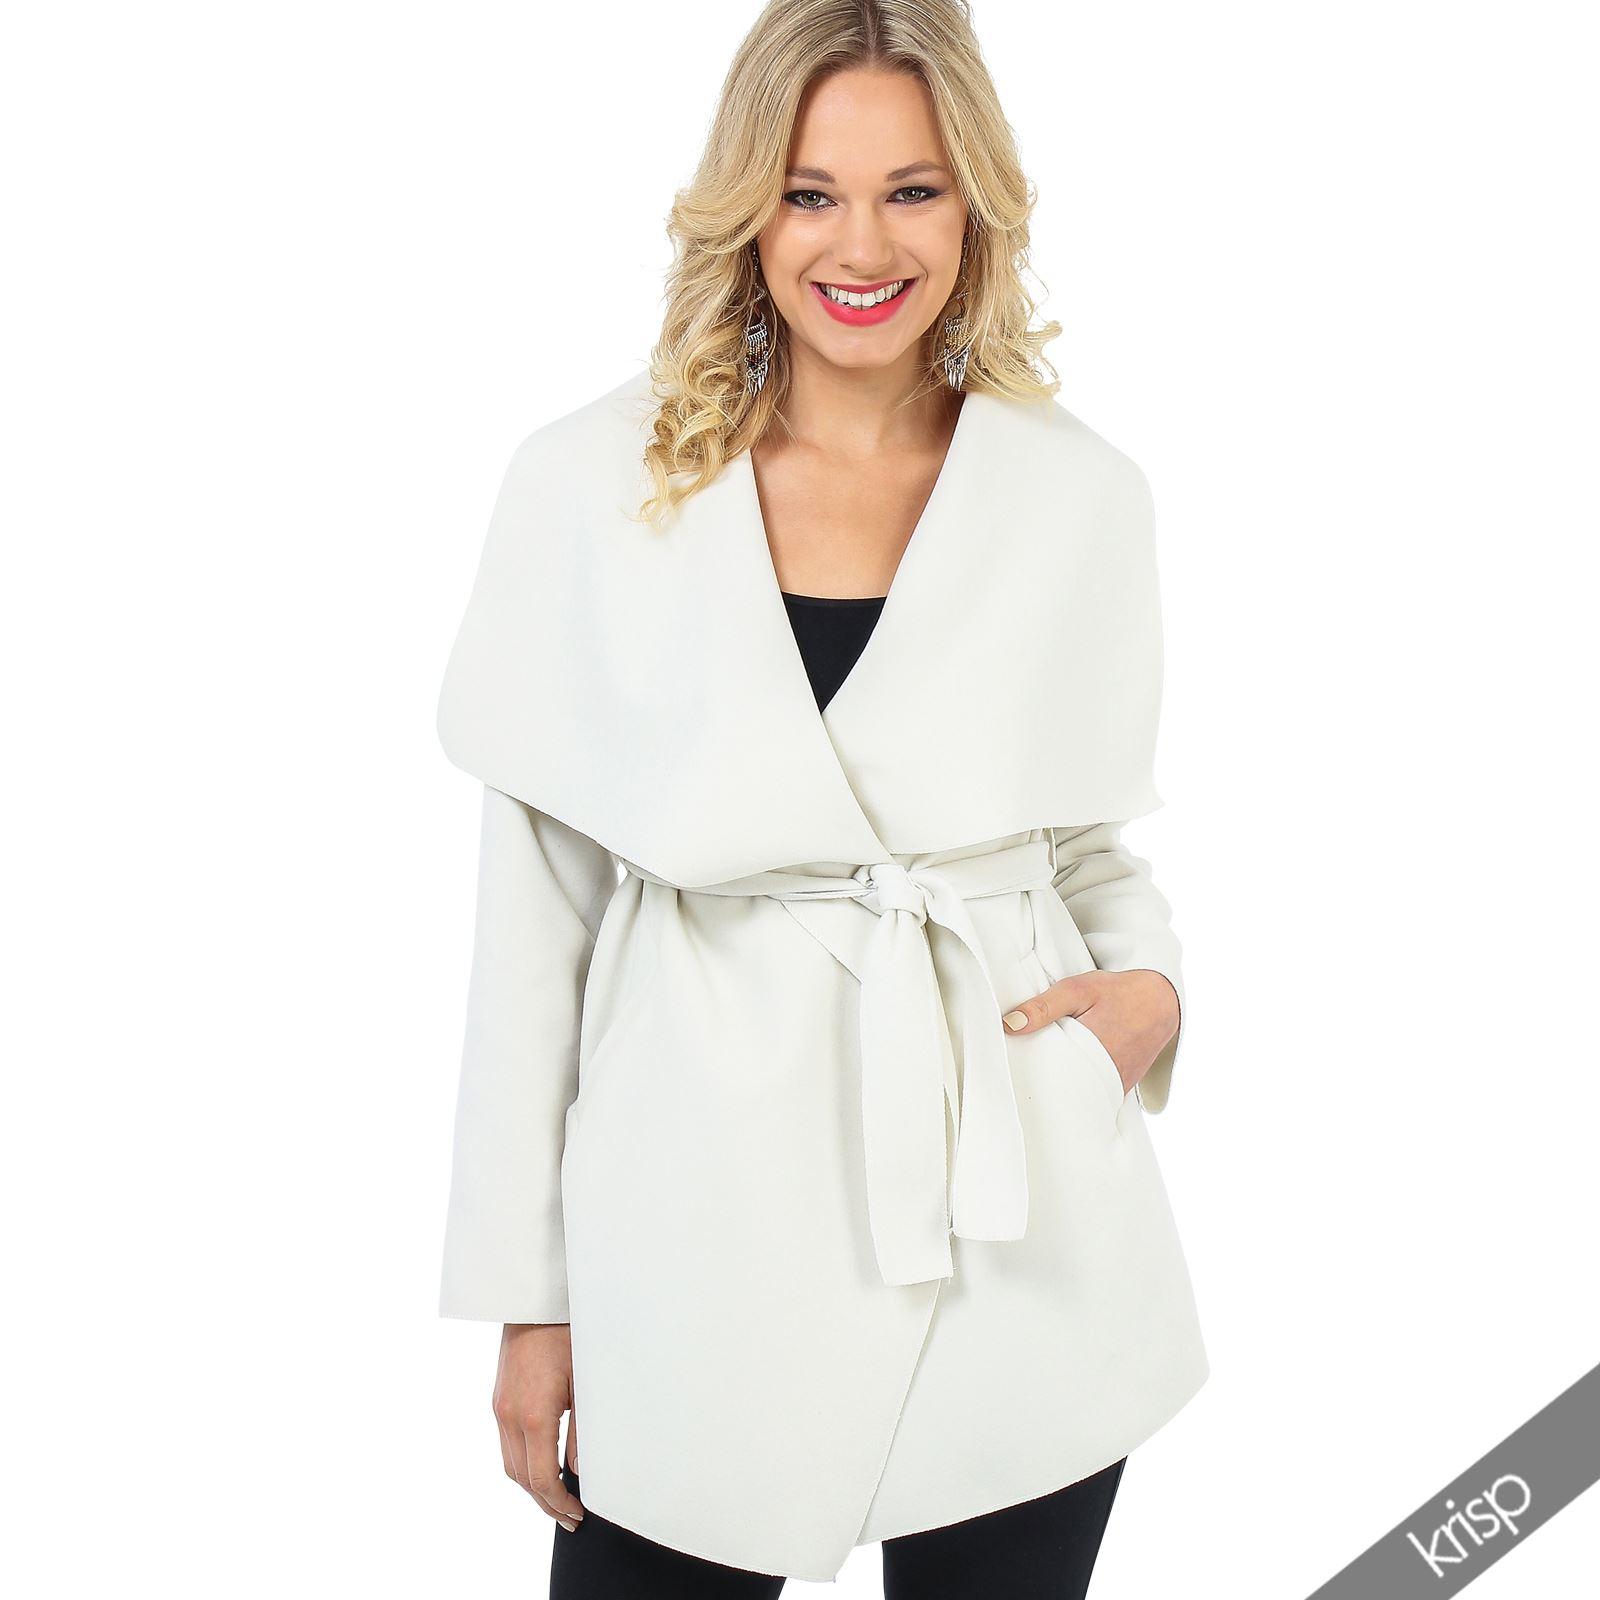 damen kurzer mantel fleece jacke cardigan cape sommermantel breiter kragen weit ebay. Black Bedroom Furniture Sets. Home Design Ideas